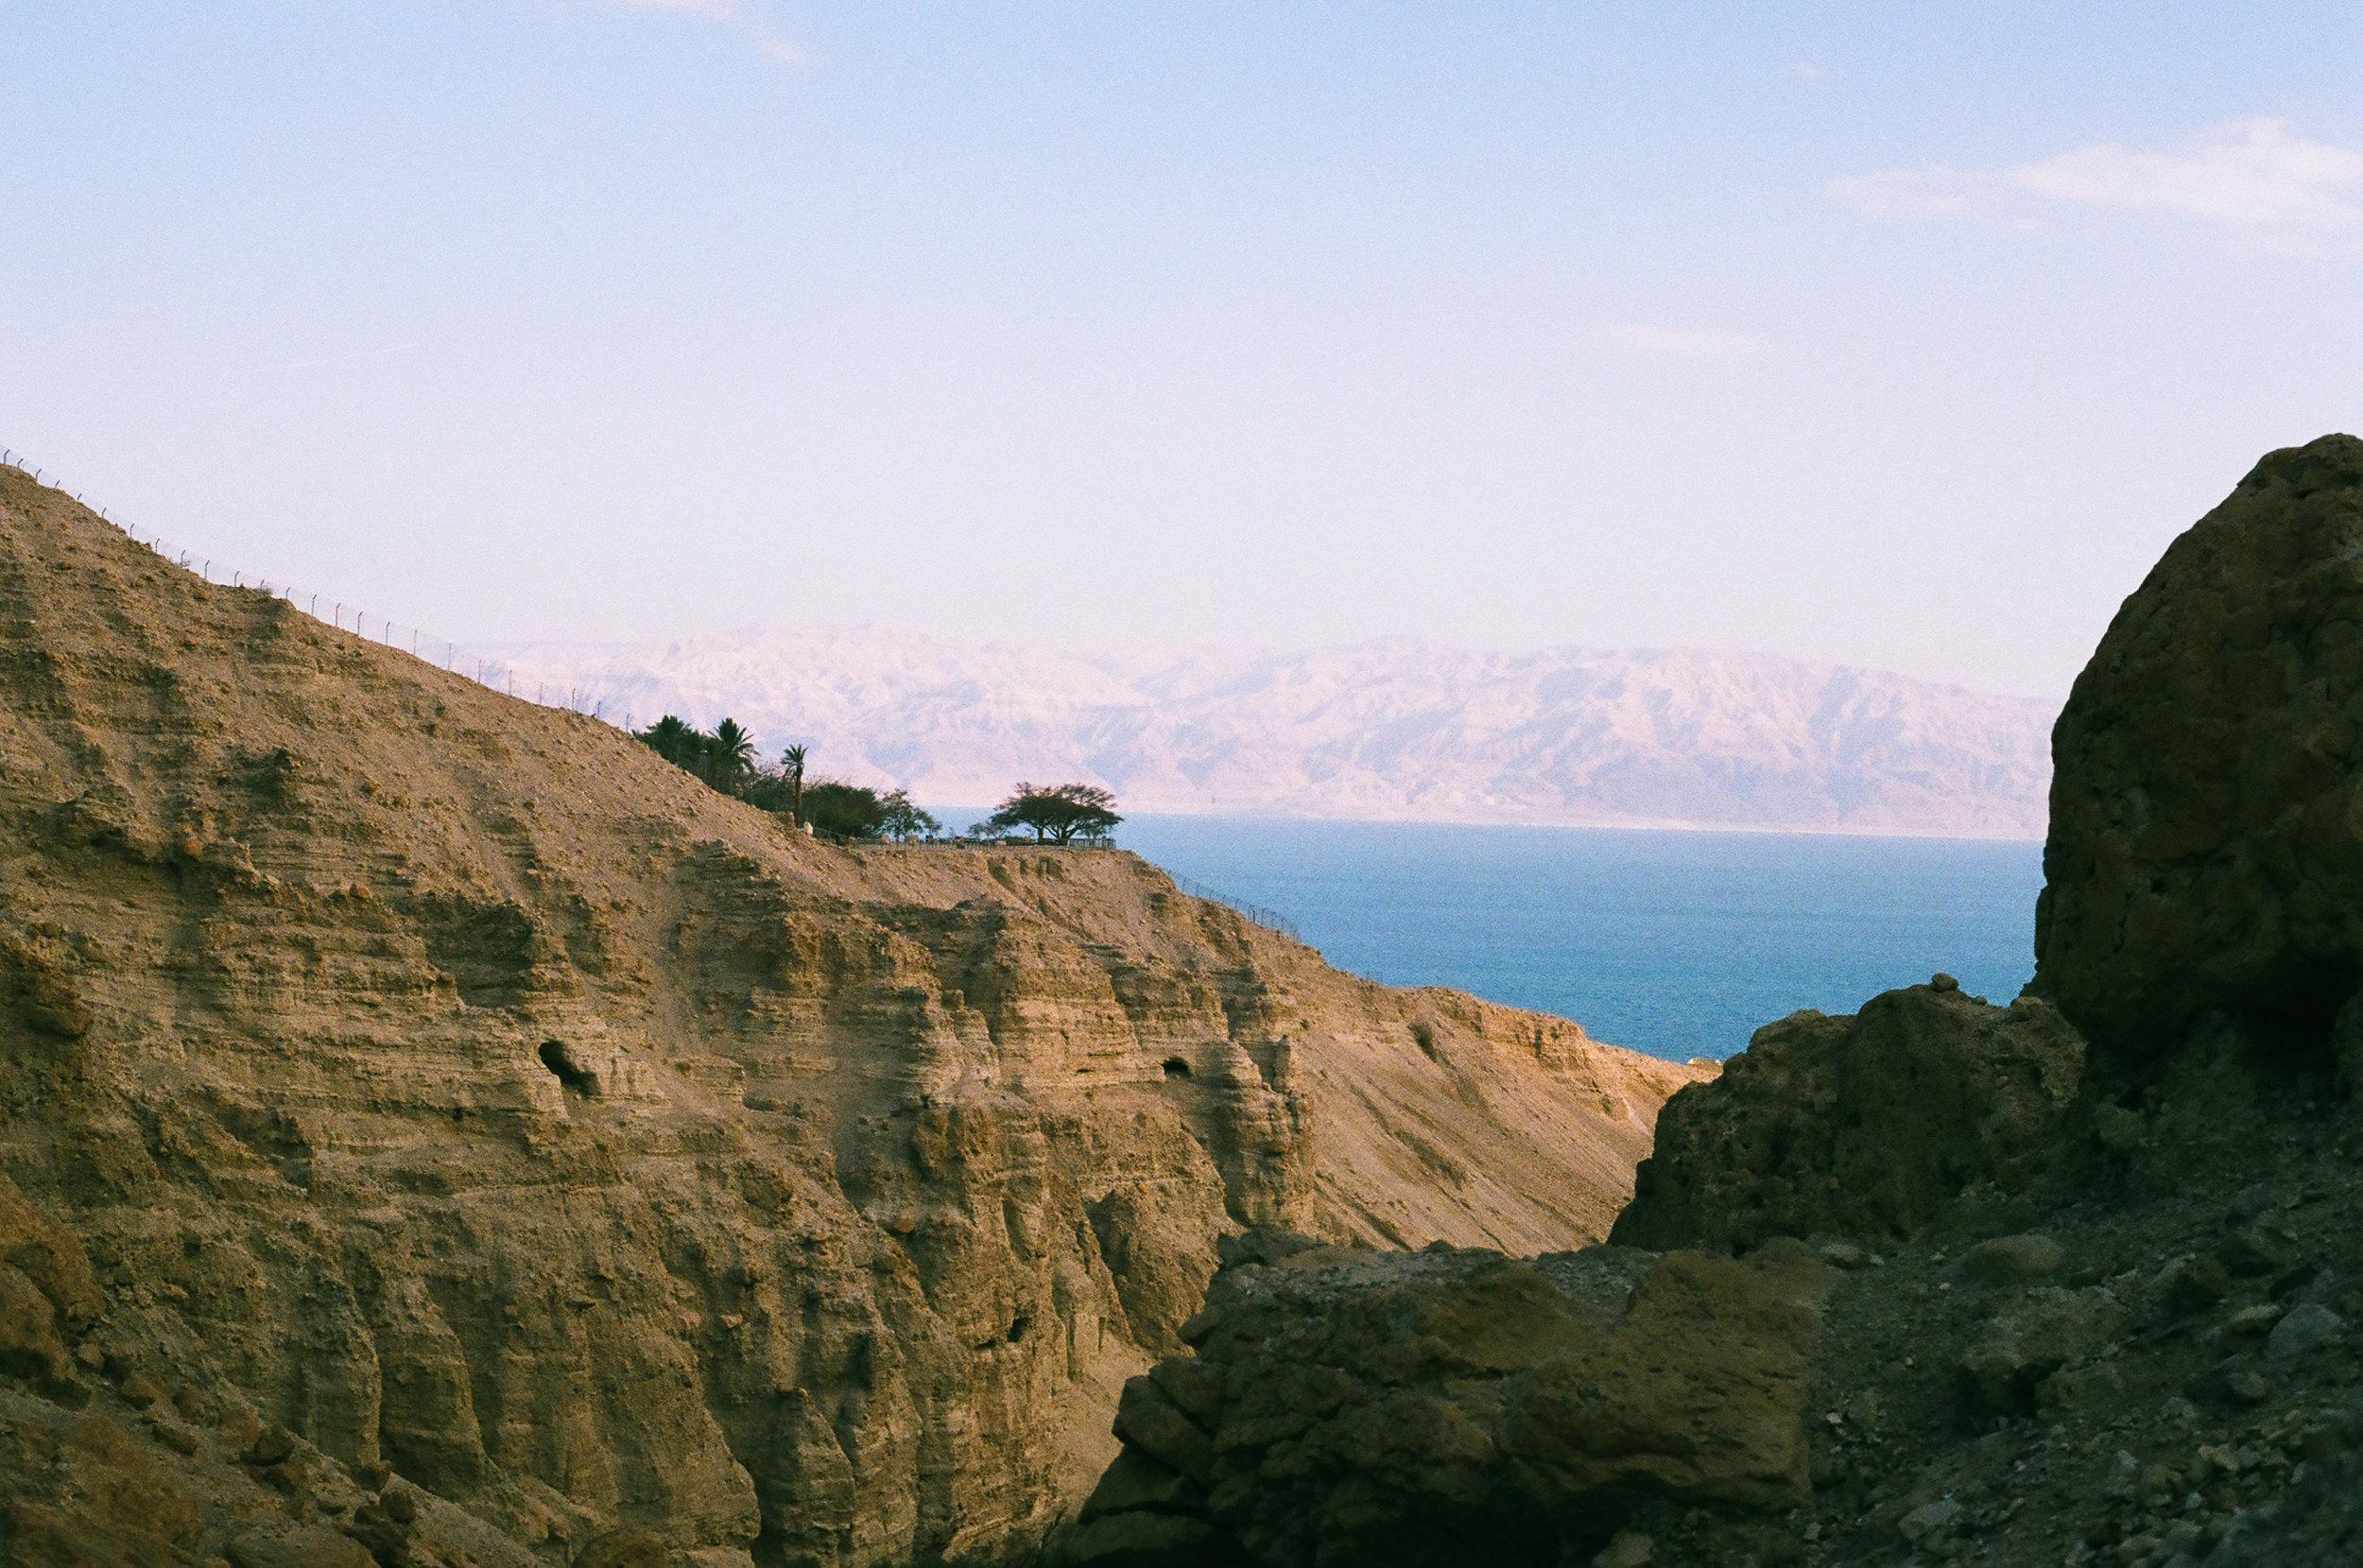 View from inside Ein Gedi